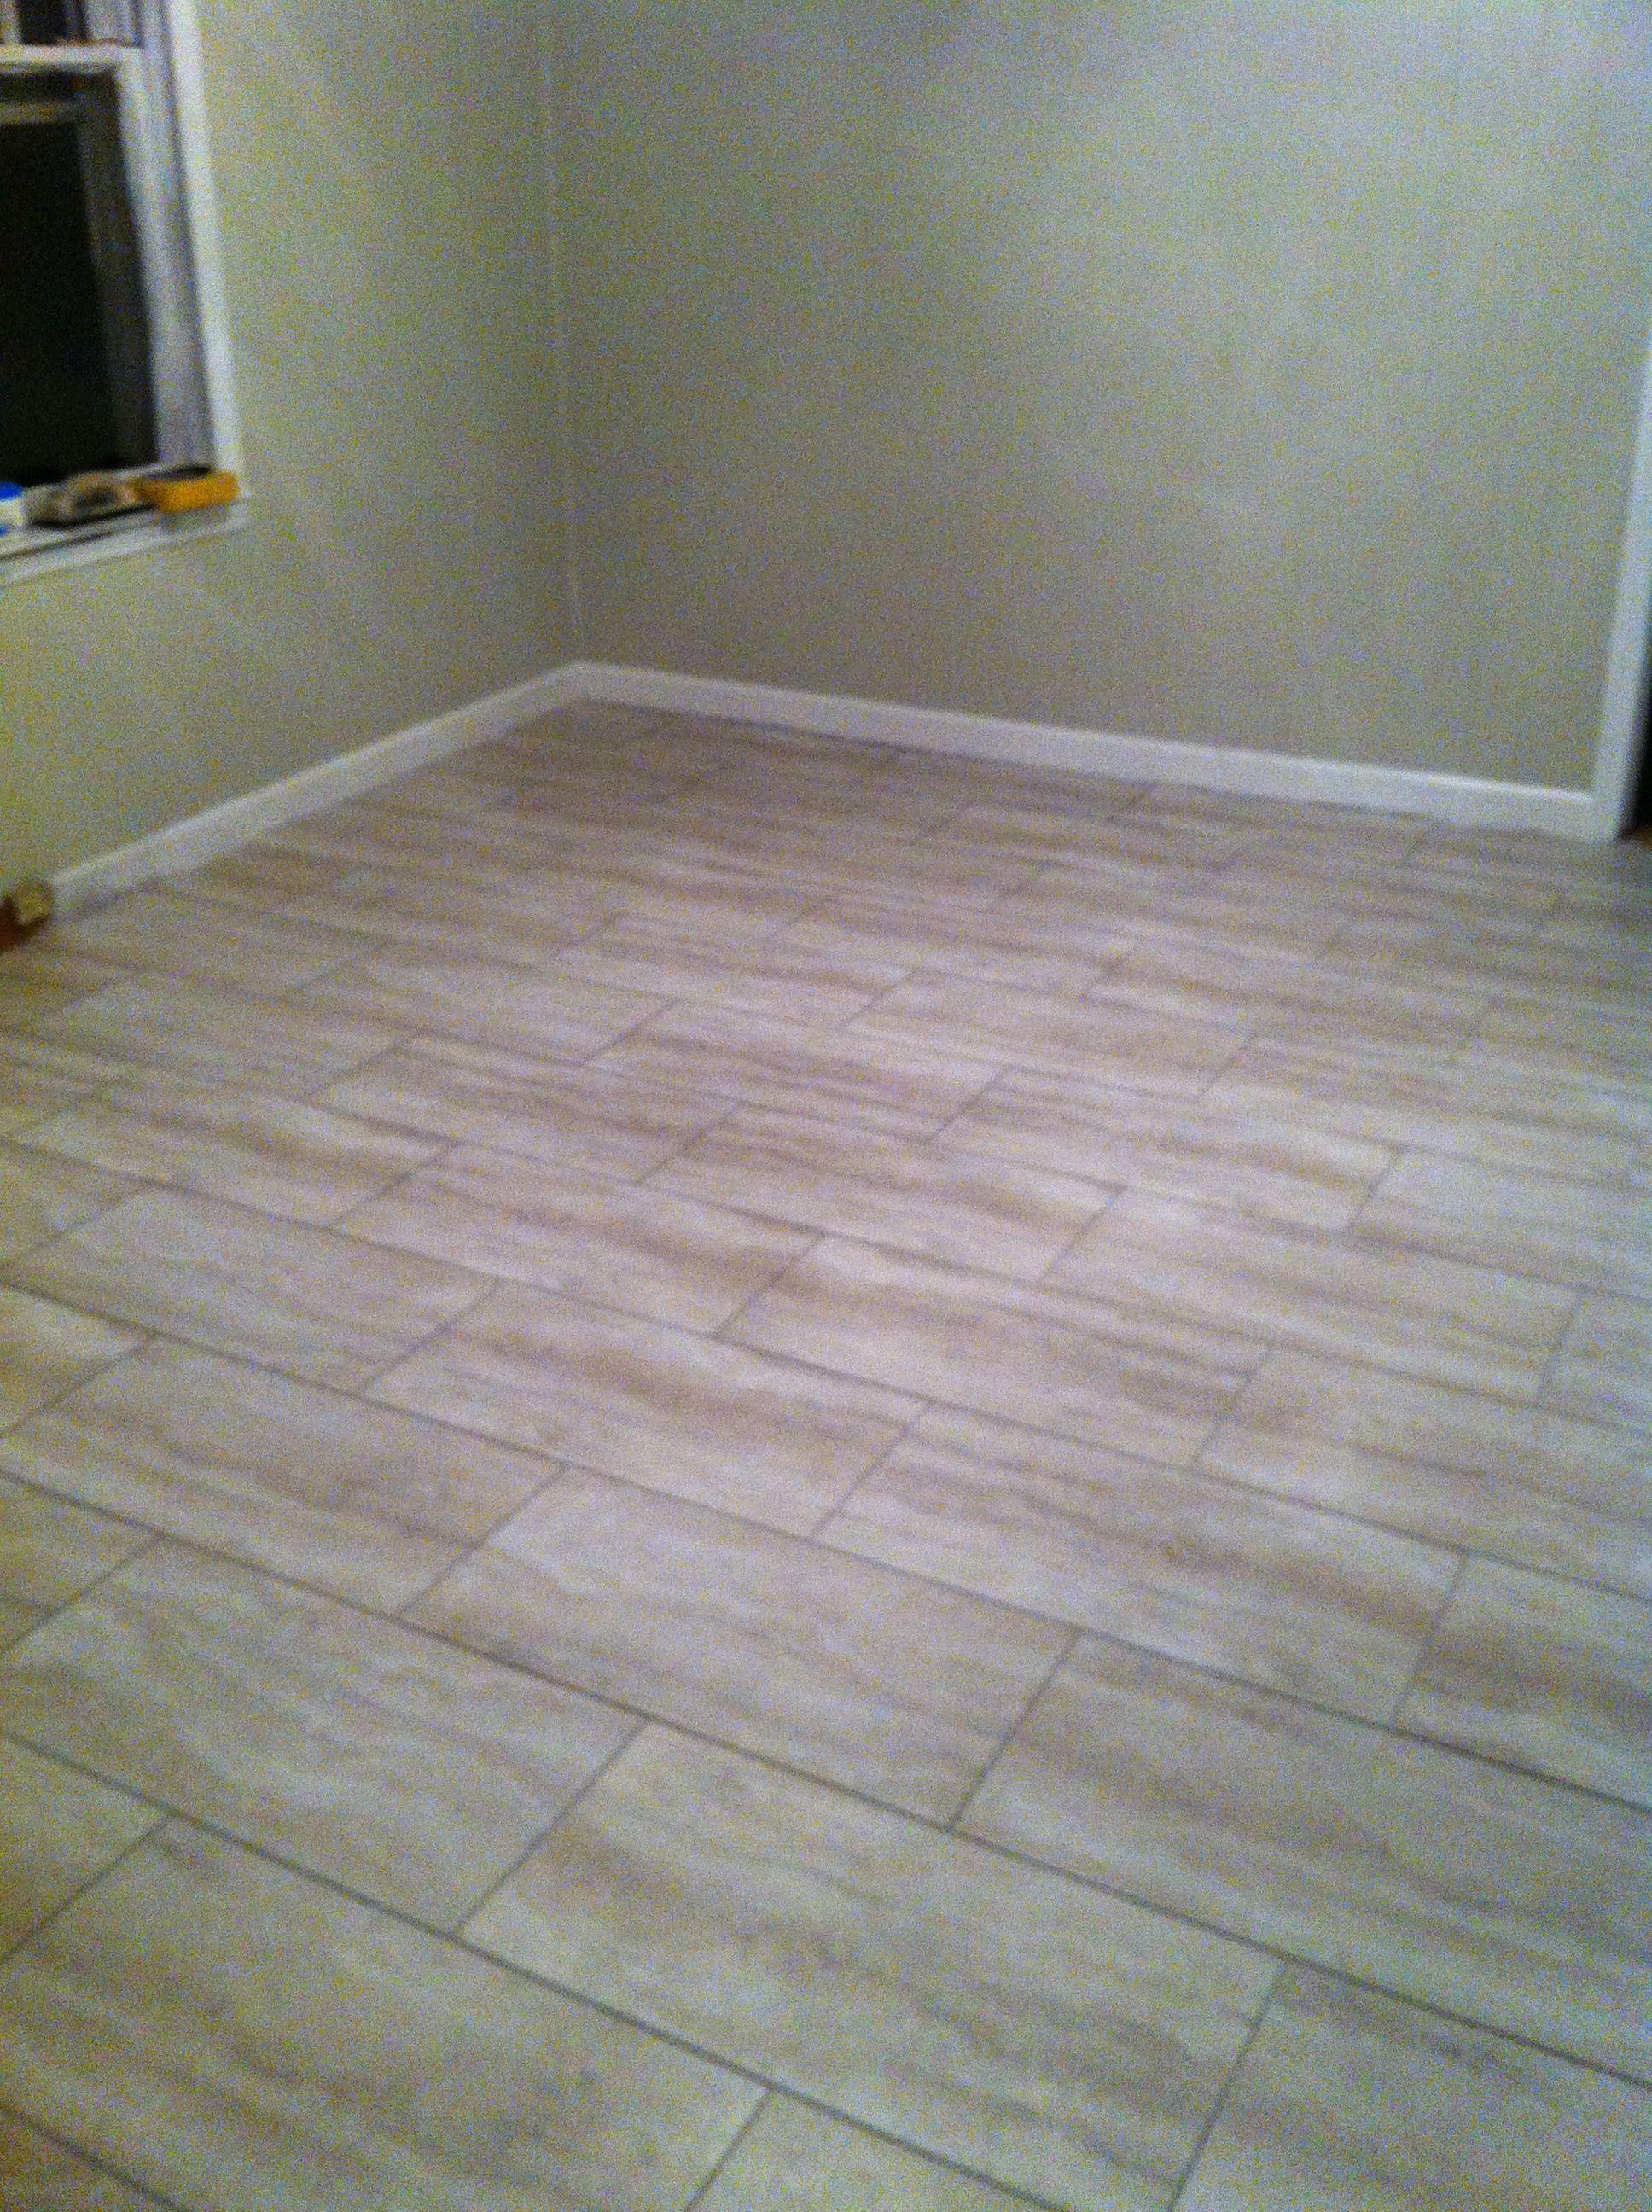 New flooring project using groutable luxury vinyl tiles